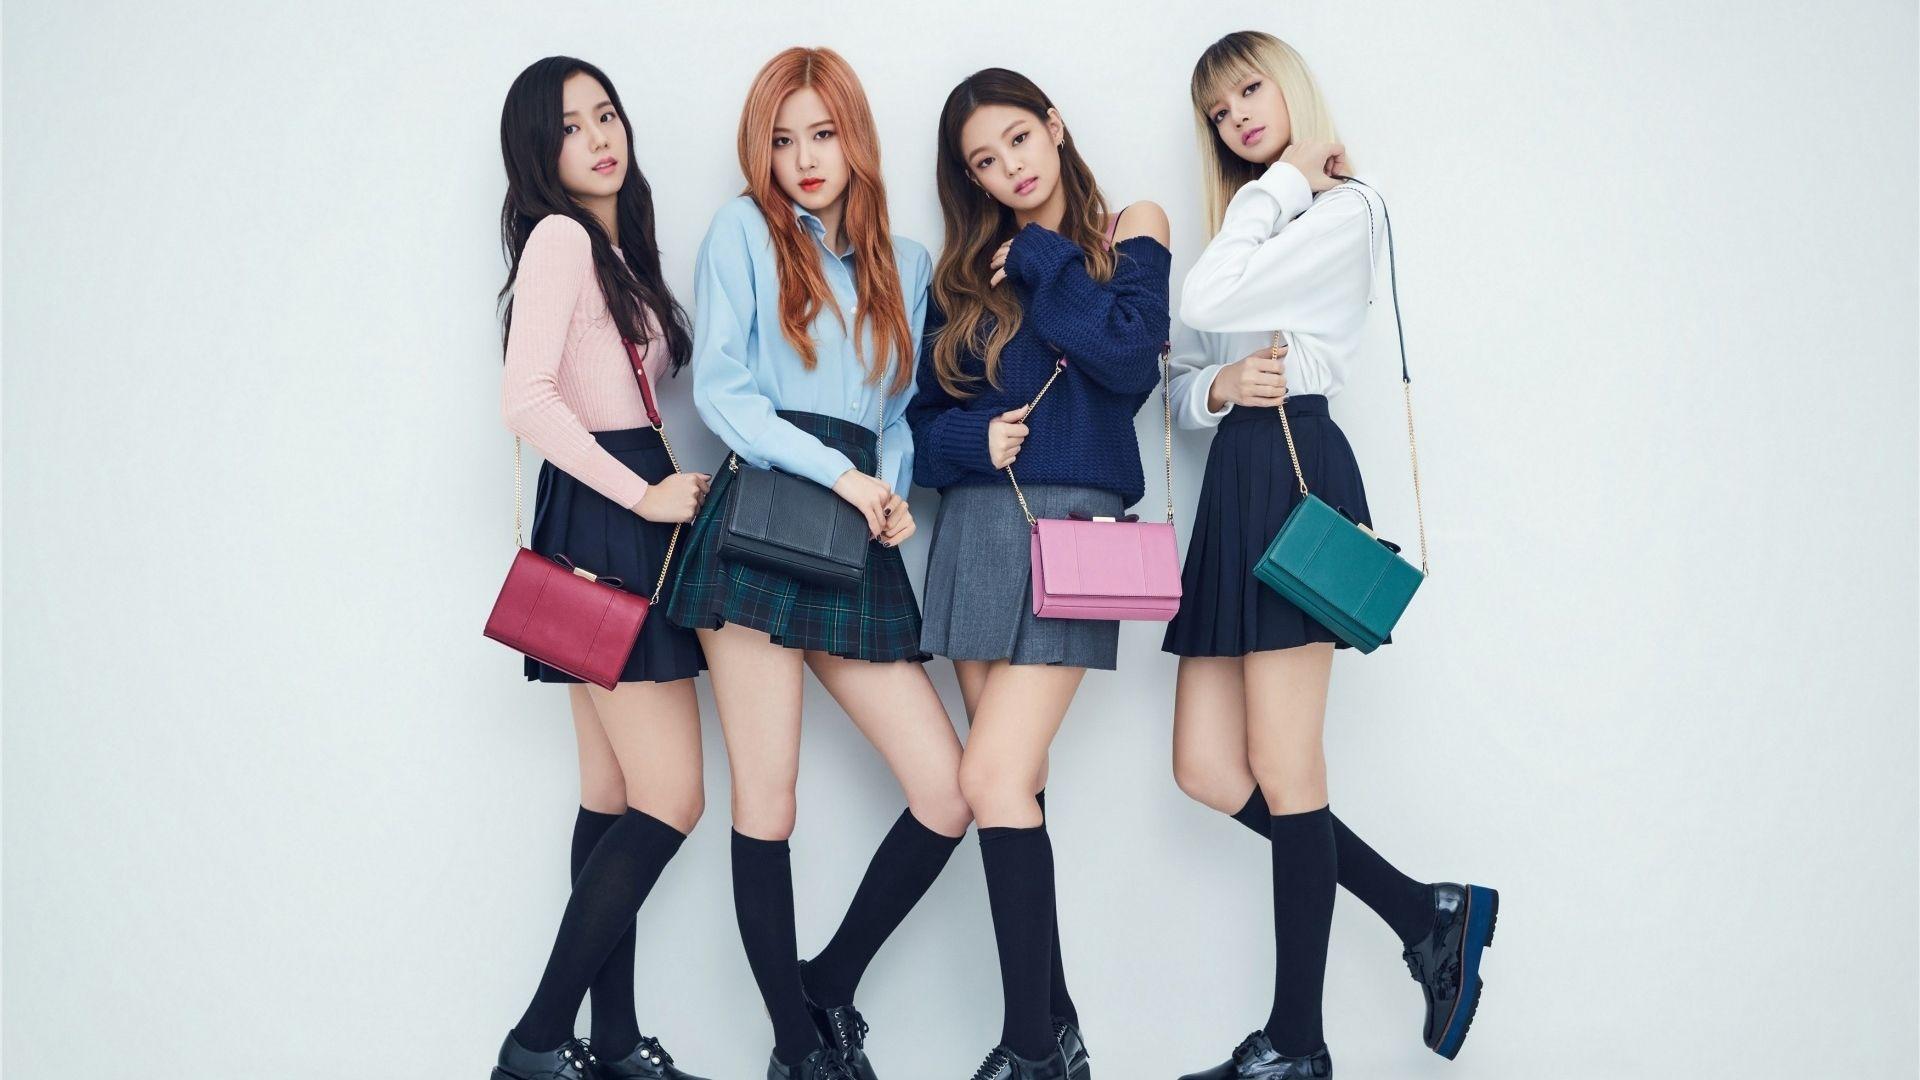 28 Blackpink Wallpaper Desktop K Pop Music Girls Group Blackpink Hd Wallpaper Download World S Best Blackpink Stock Pictures P In 2020 K Pop Music Pop Music Blackpink